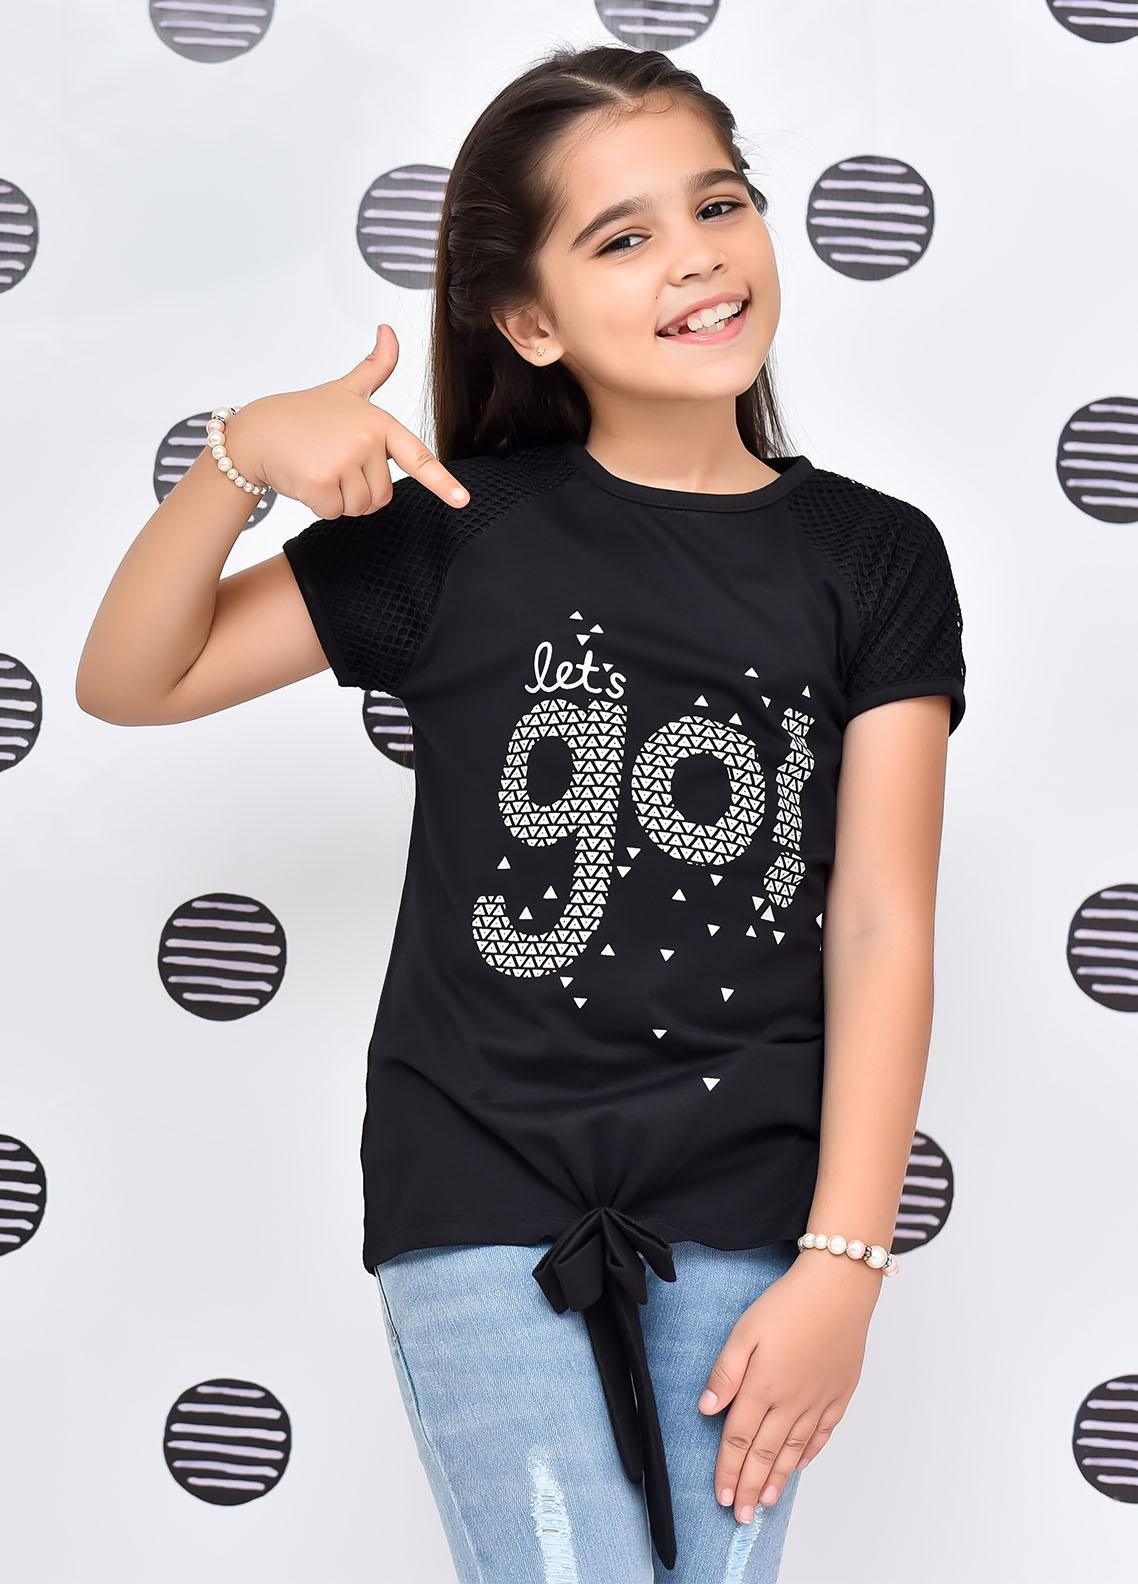 Ochre Cotton Western Top for Girls -  OGK-90 Black